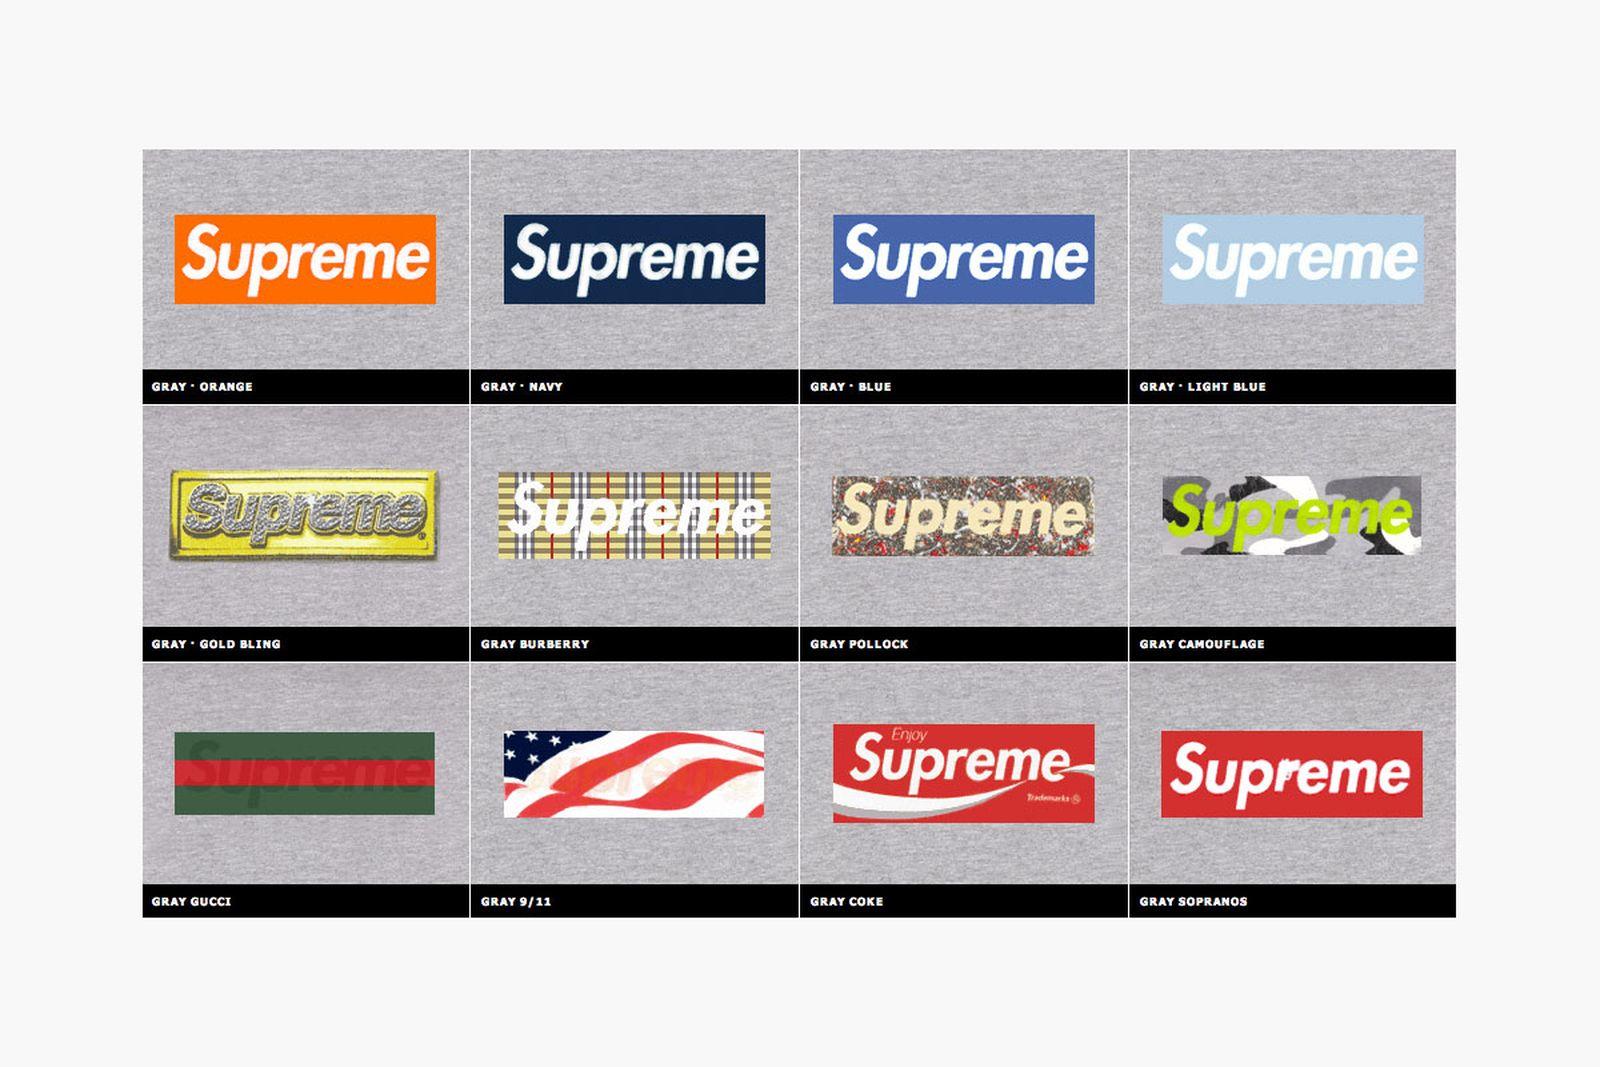 20-years-supreme-box-logo-9